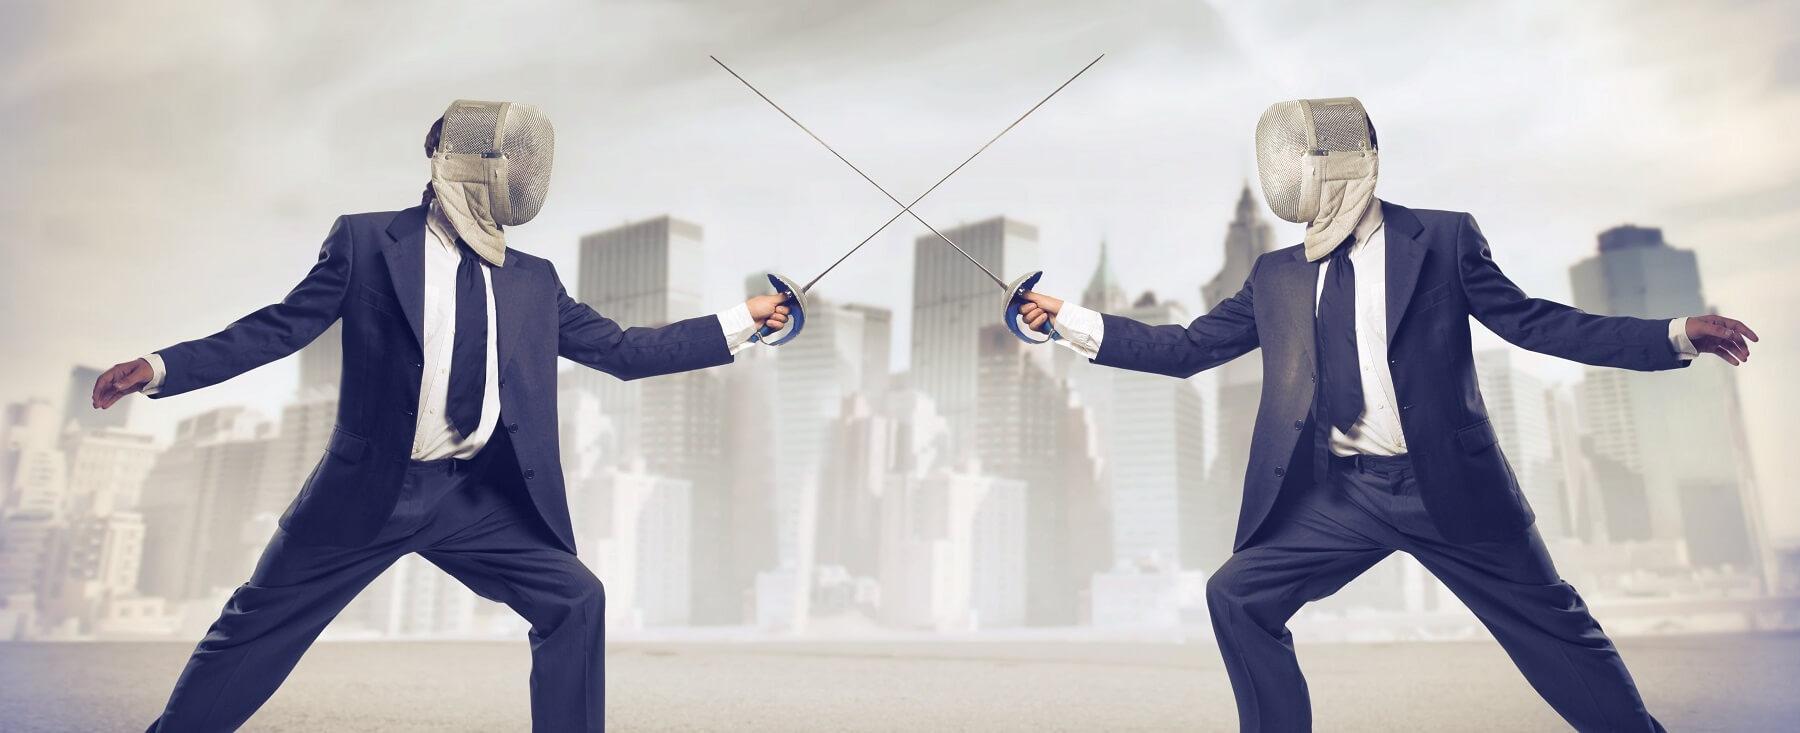 Победить в споре